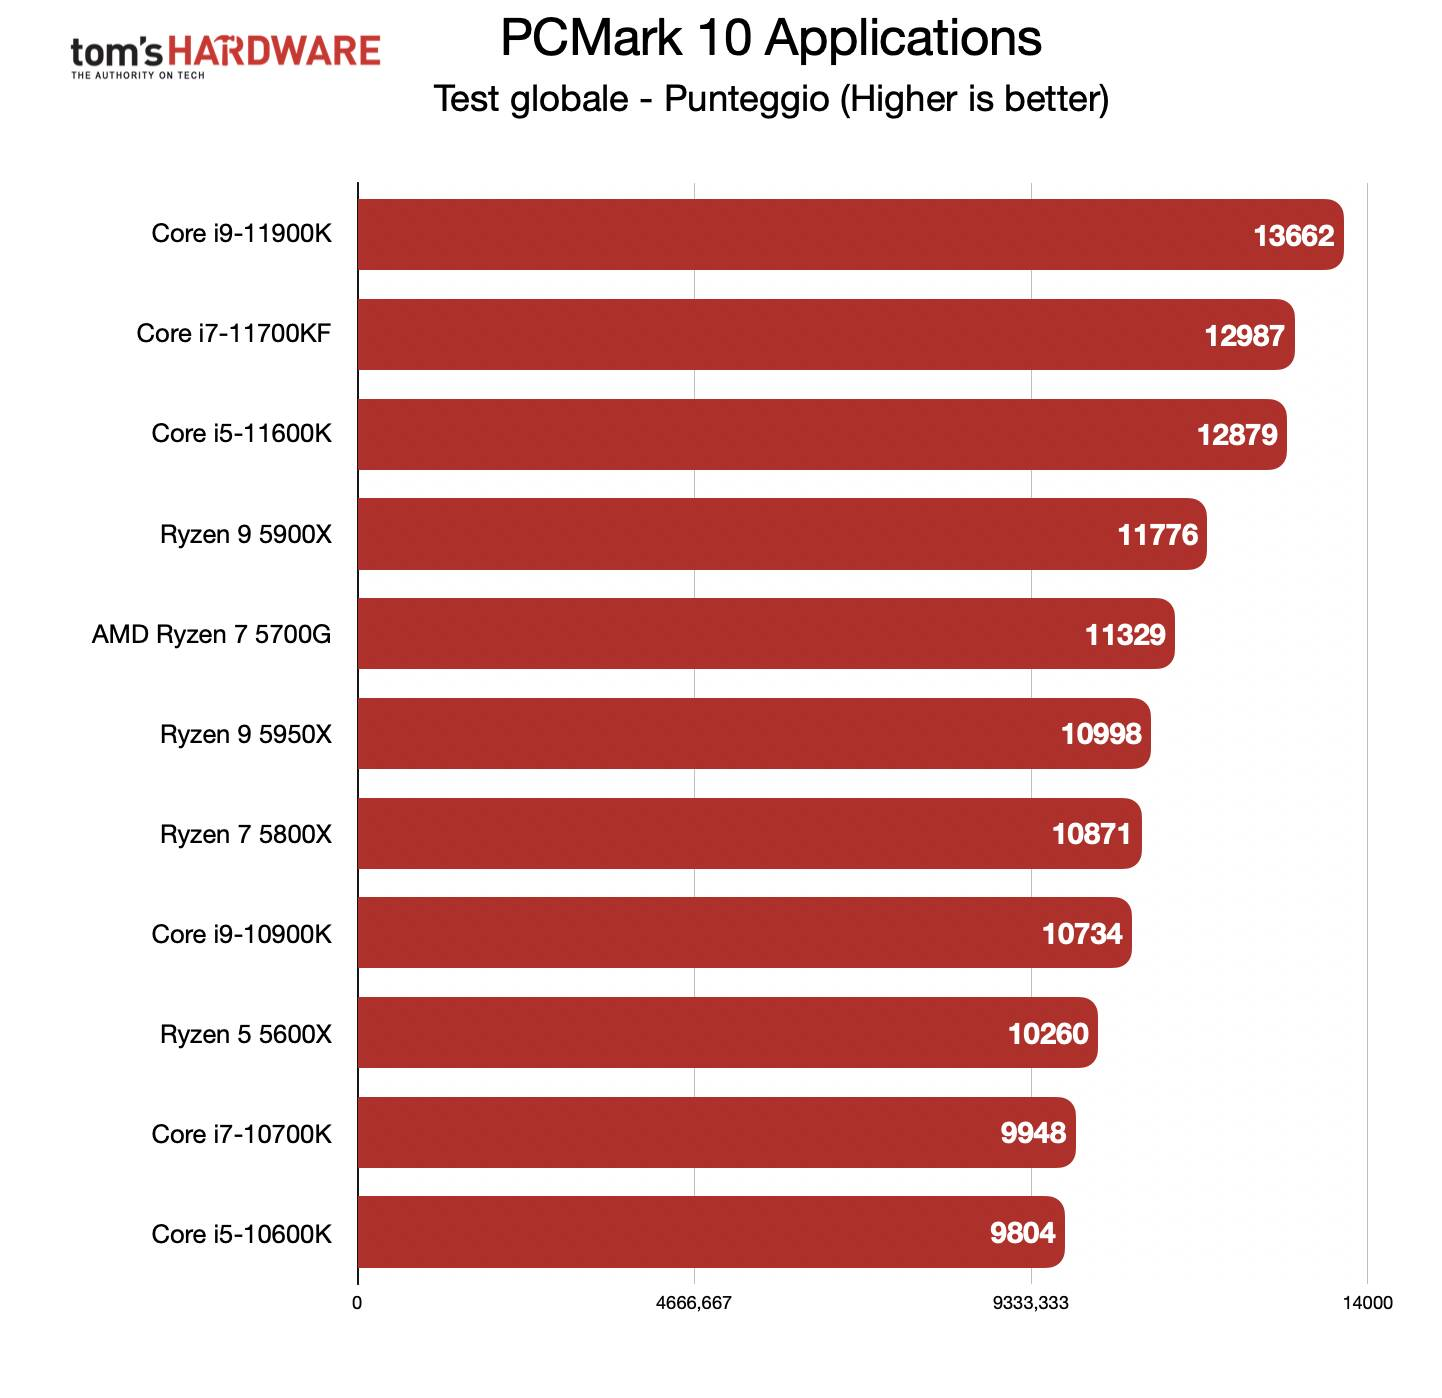 Benchmark Ryzen 7 5700G - PCMark 10 Applications